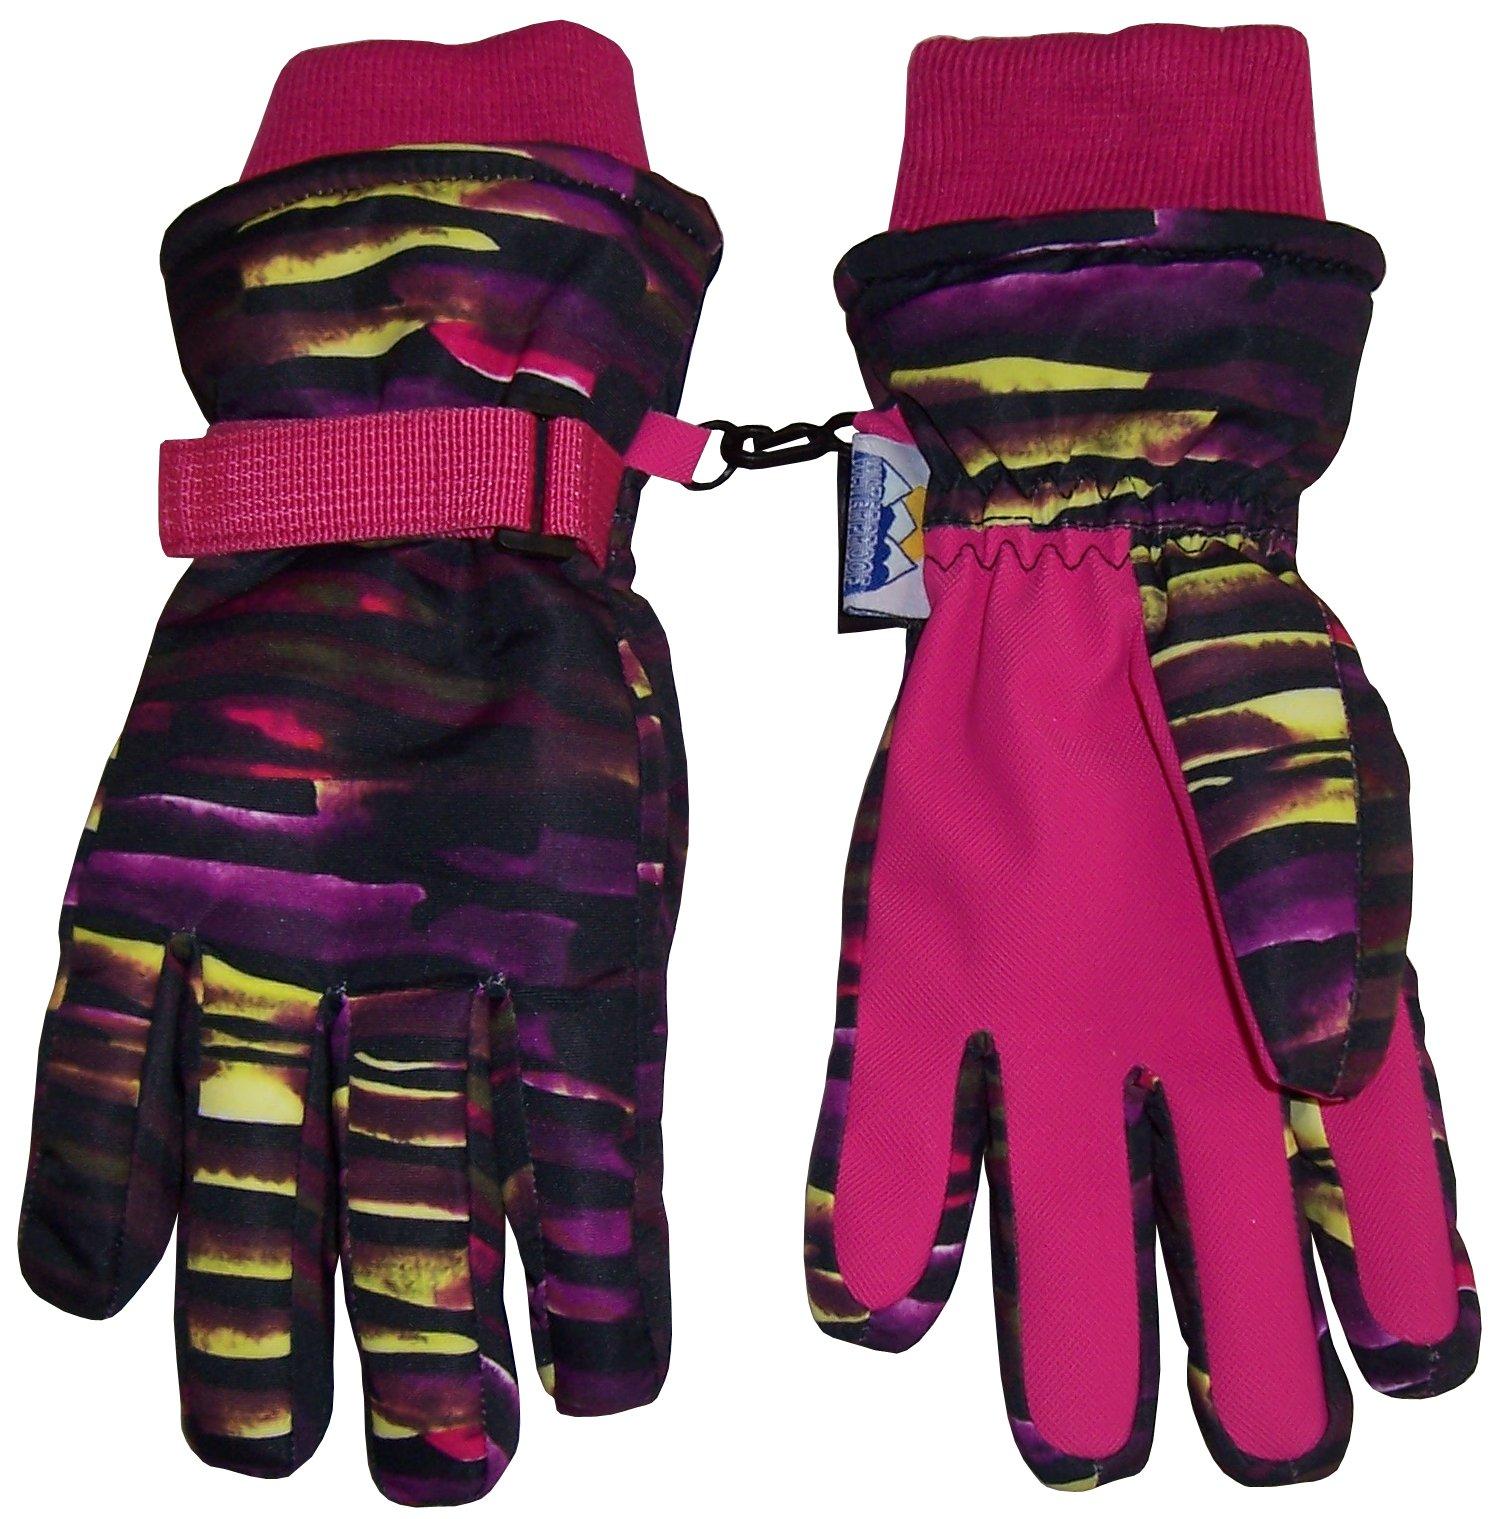 N'Ice Caps Kids Cold Weather Waterproof Camo Print Thinsulate Ski Gloves (Fuchsia Neon Stripe, 8-10 Years)